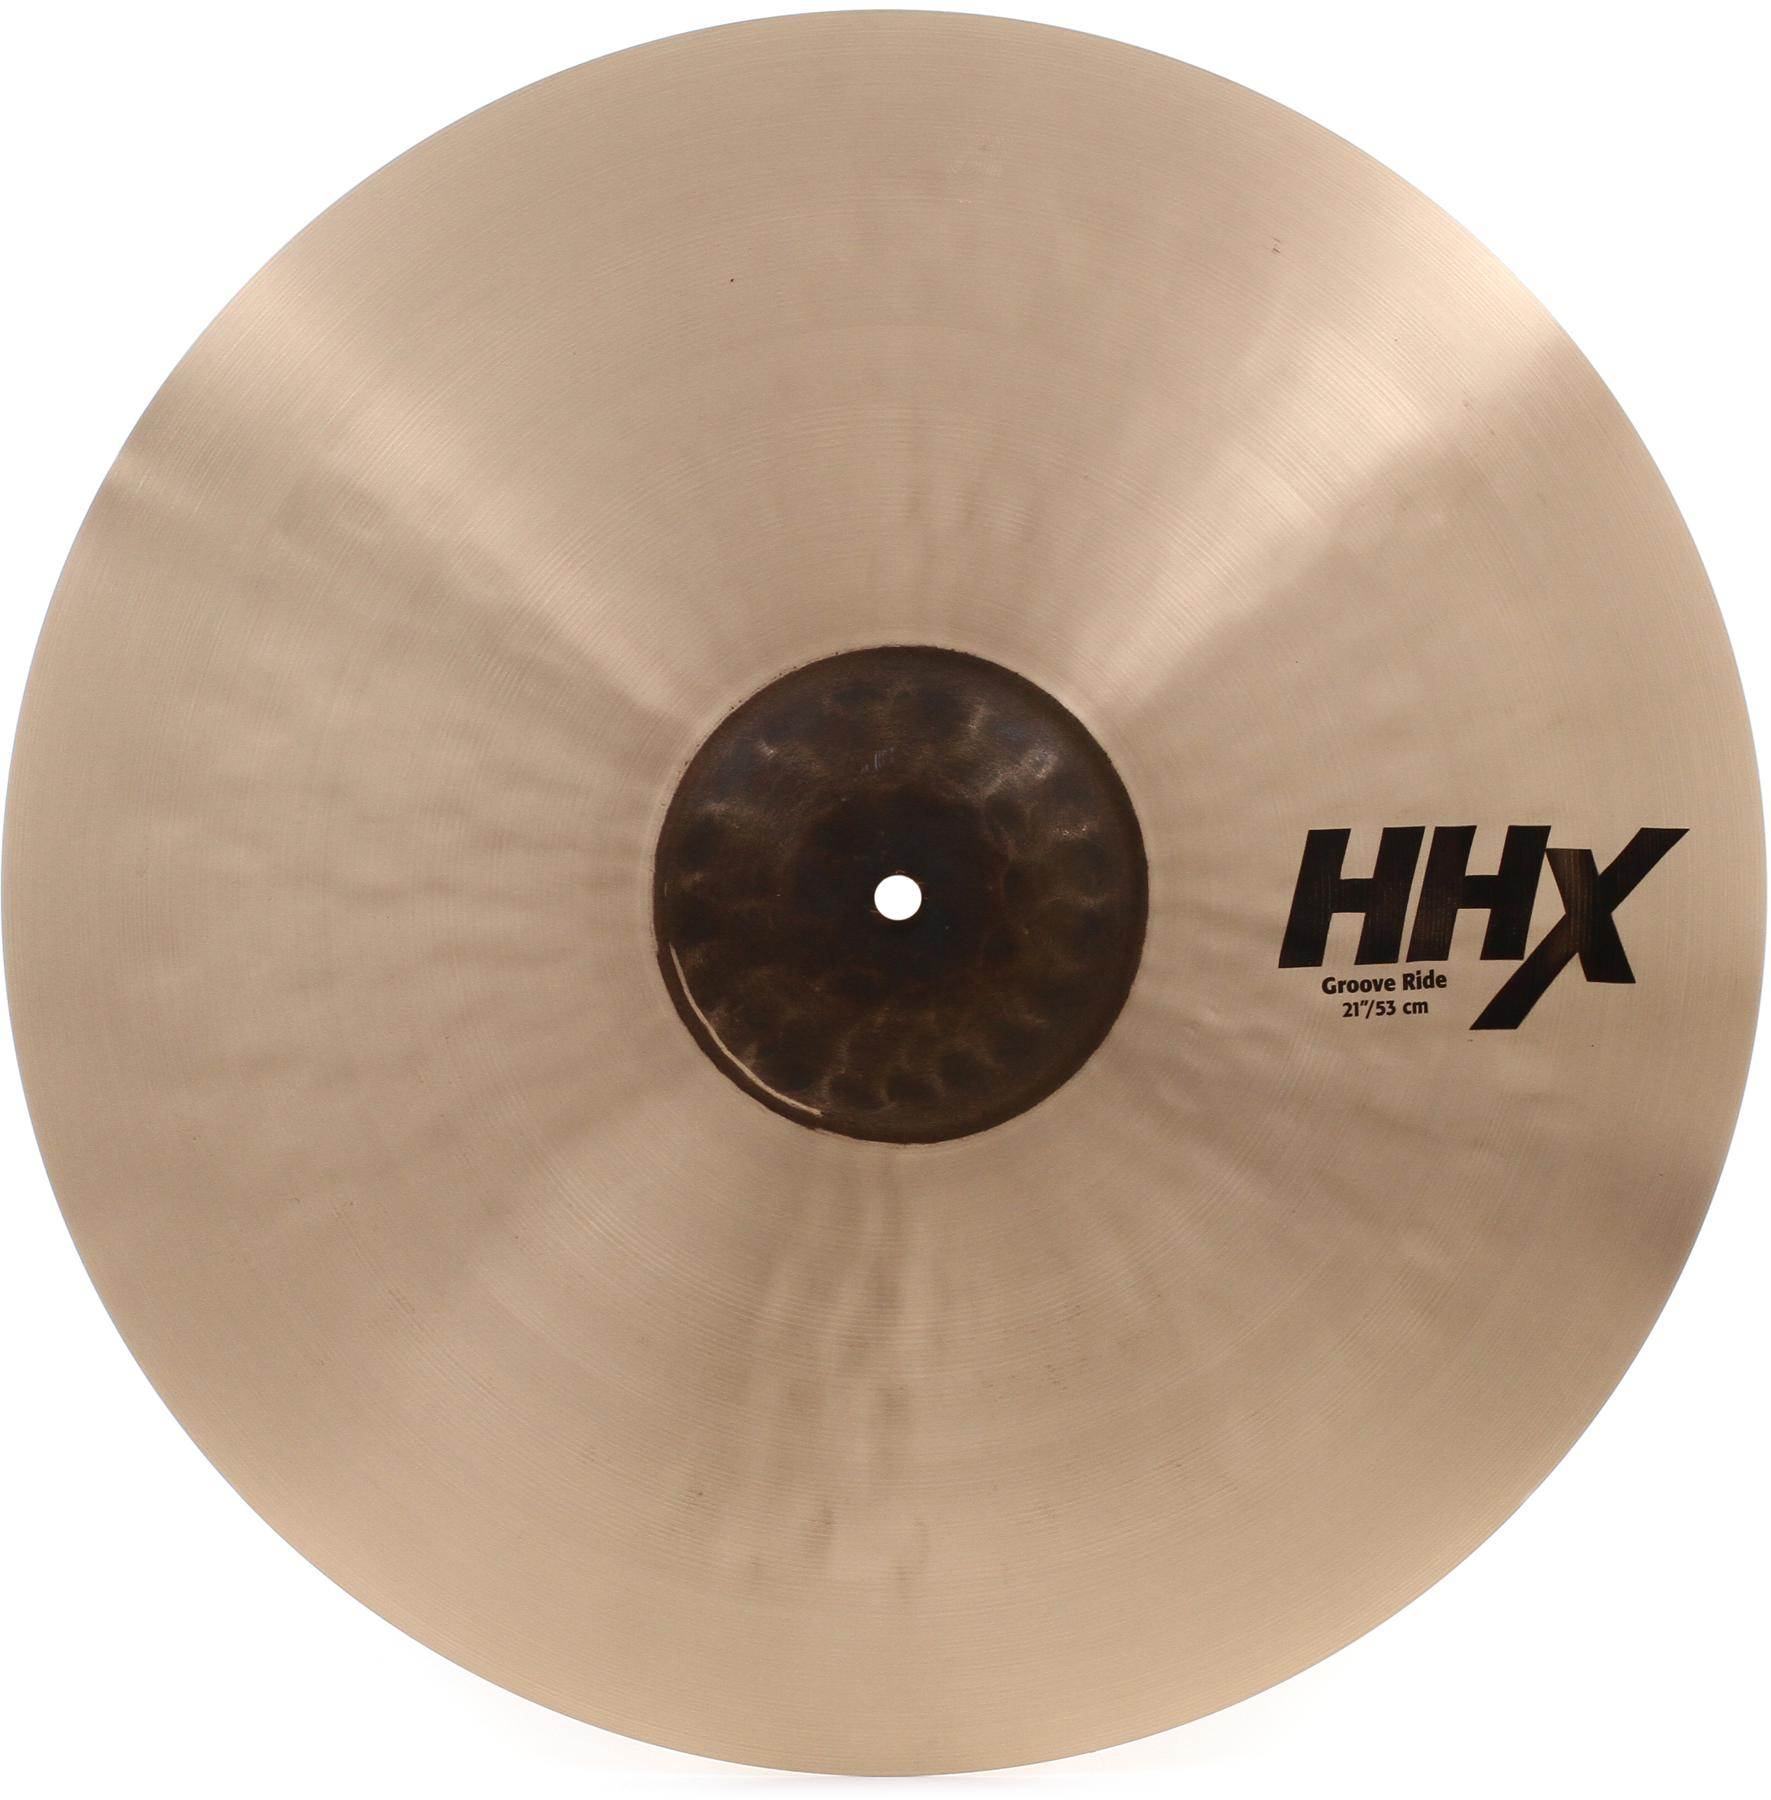 "4. Sabian 21"" HHX Groove Ride"